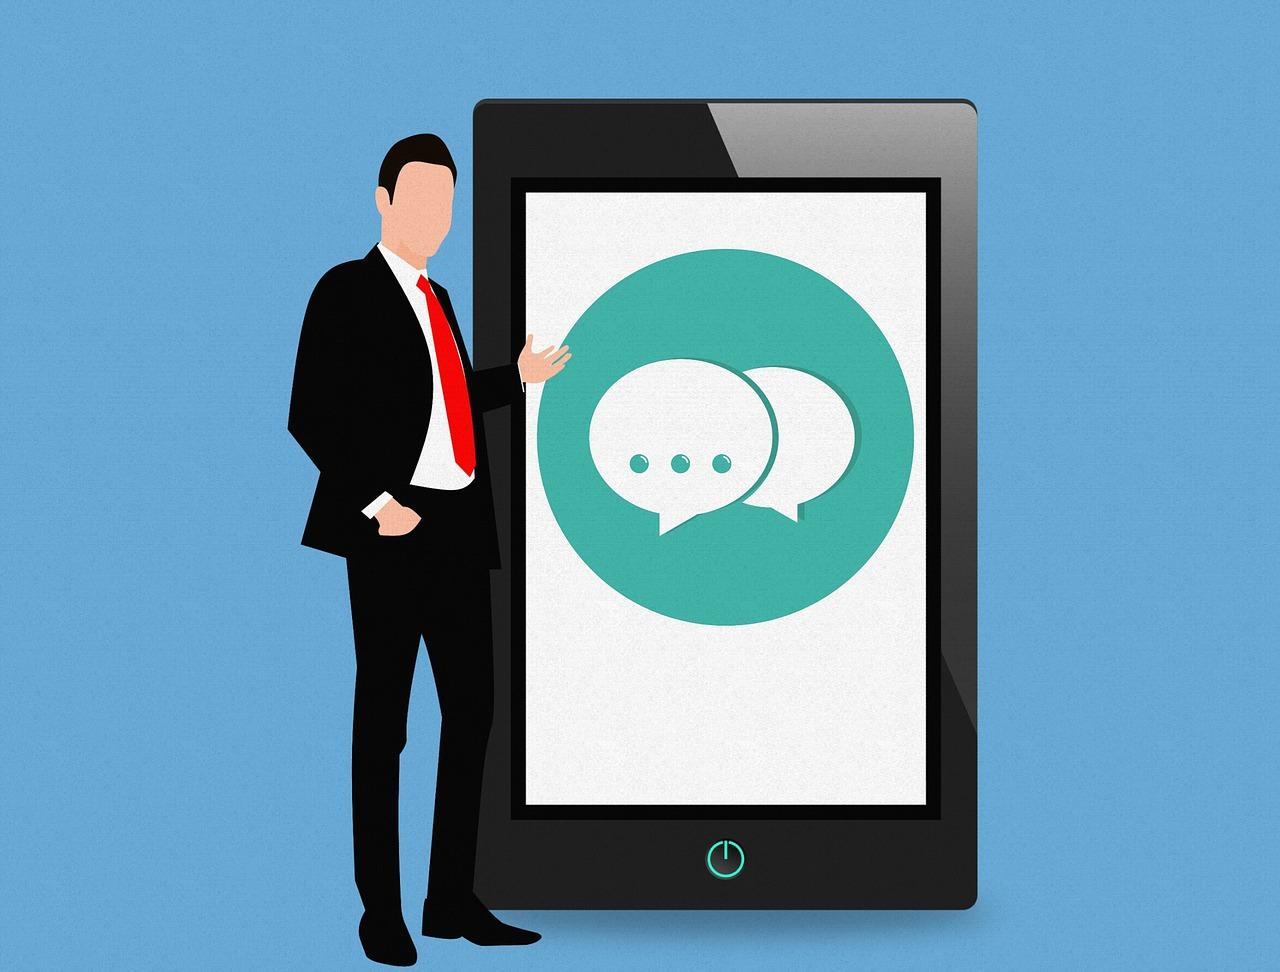 desviar mensajes de texto a otro celular